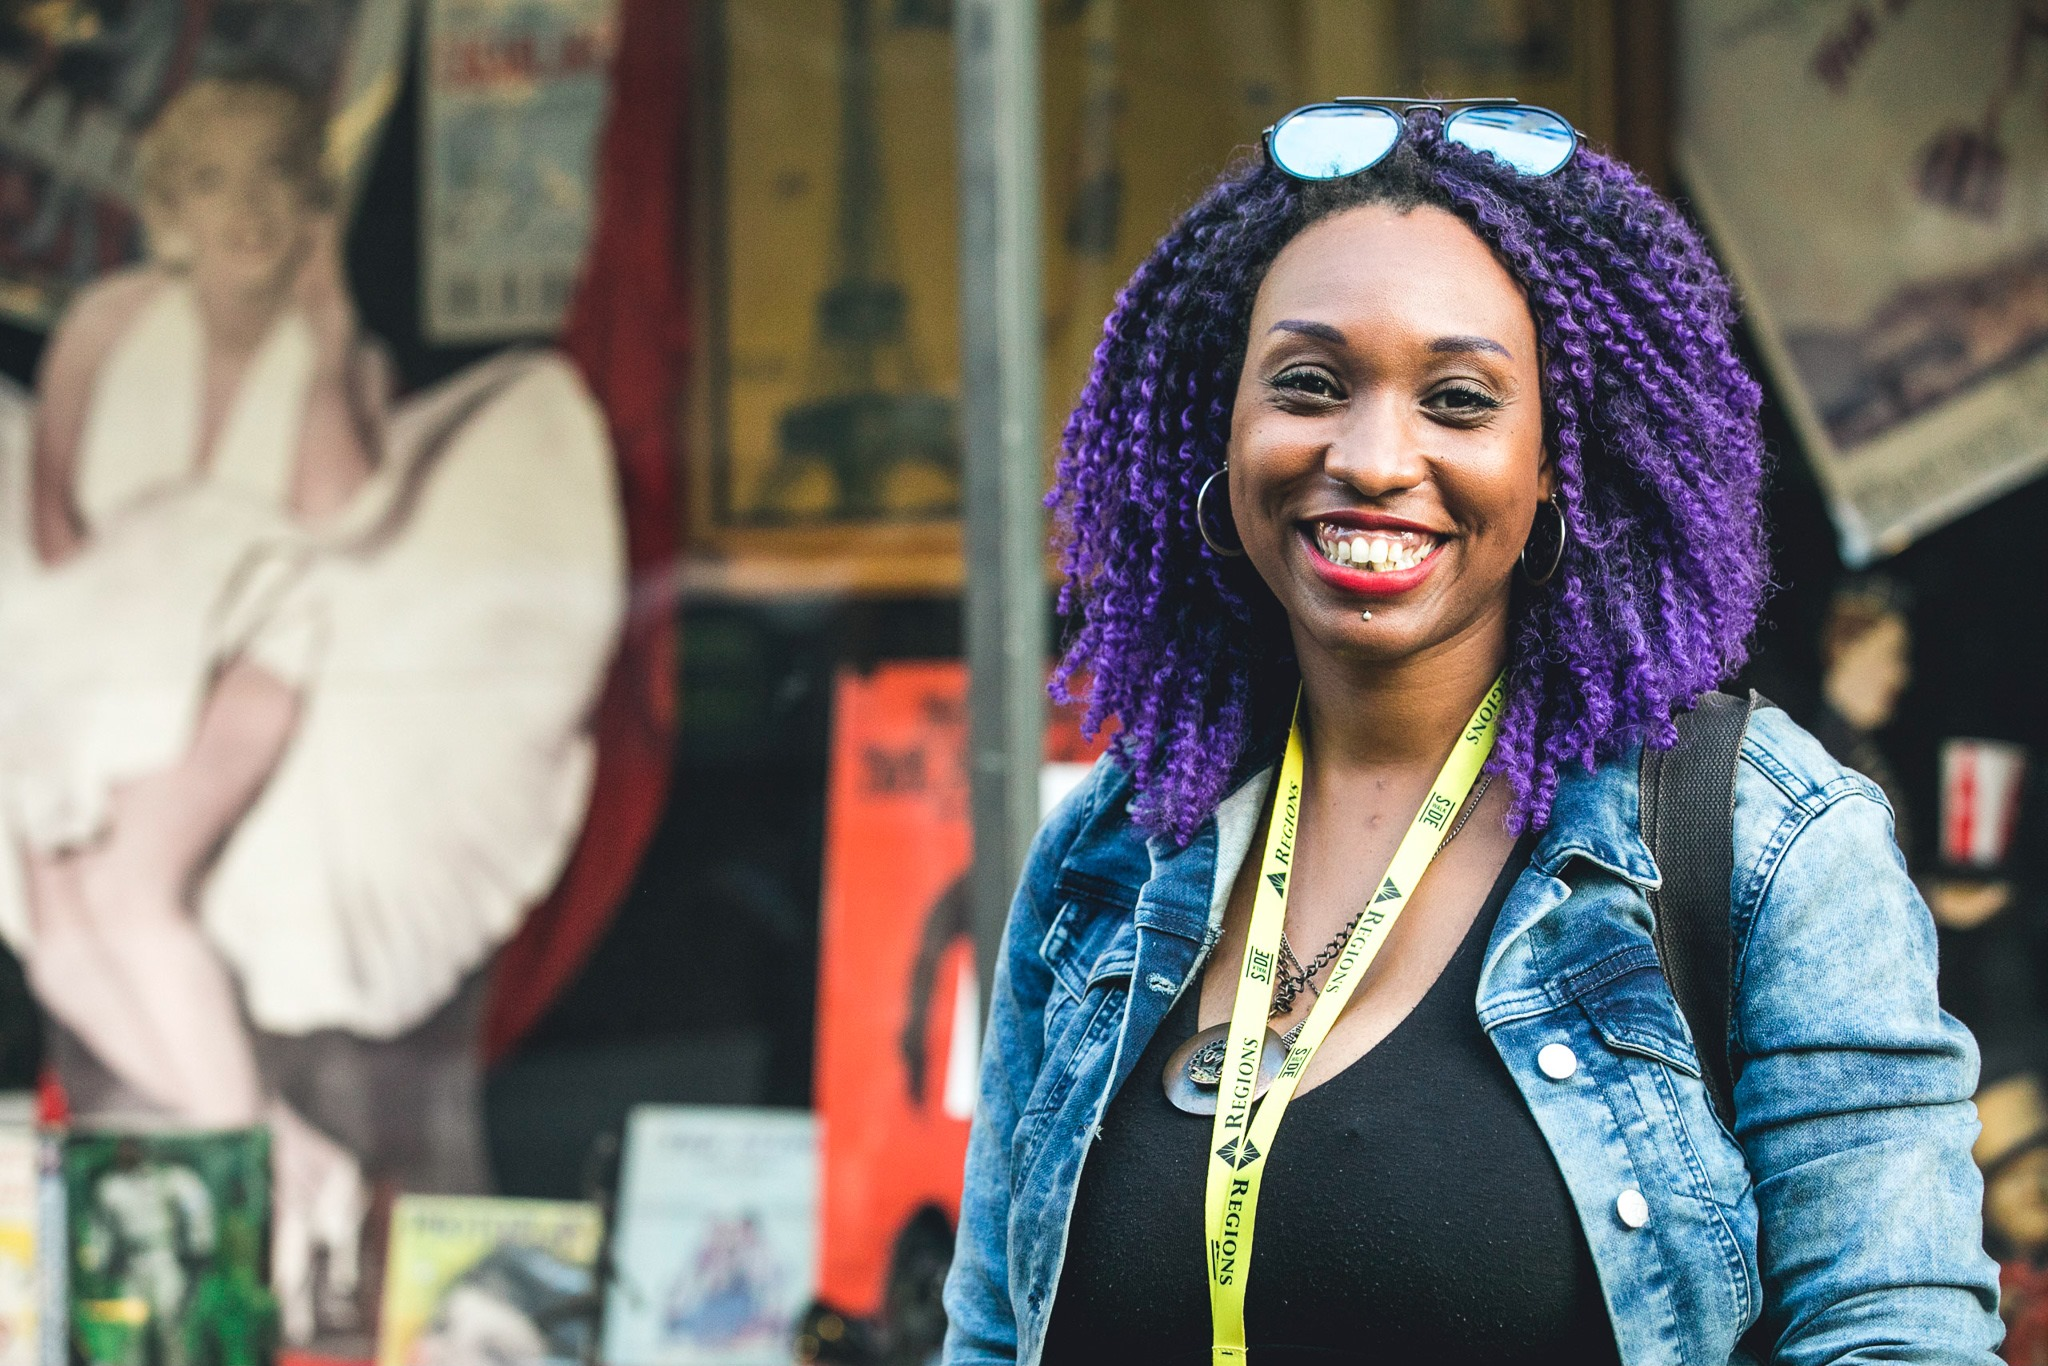 4 Birmingham artists are stars at Sidewalk 2021—learn more